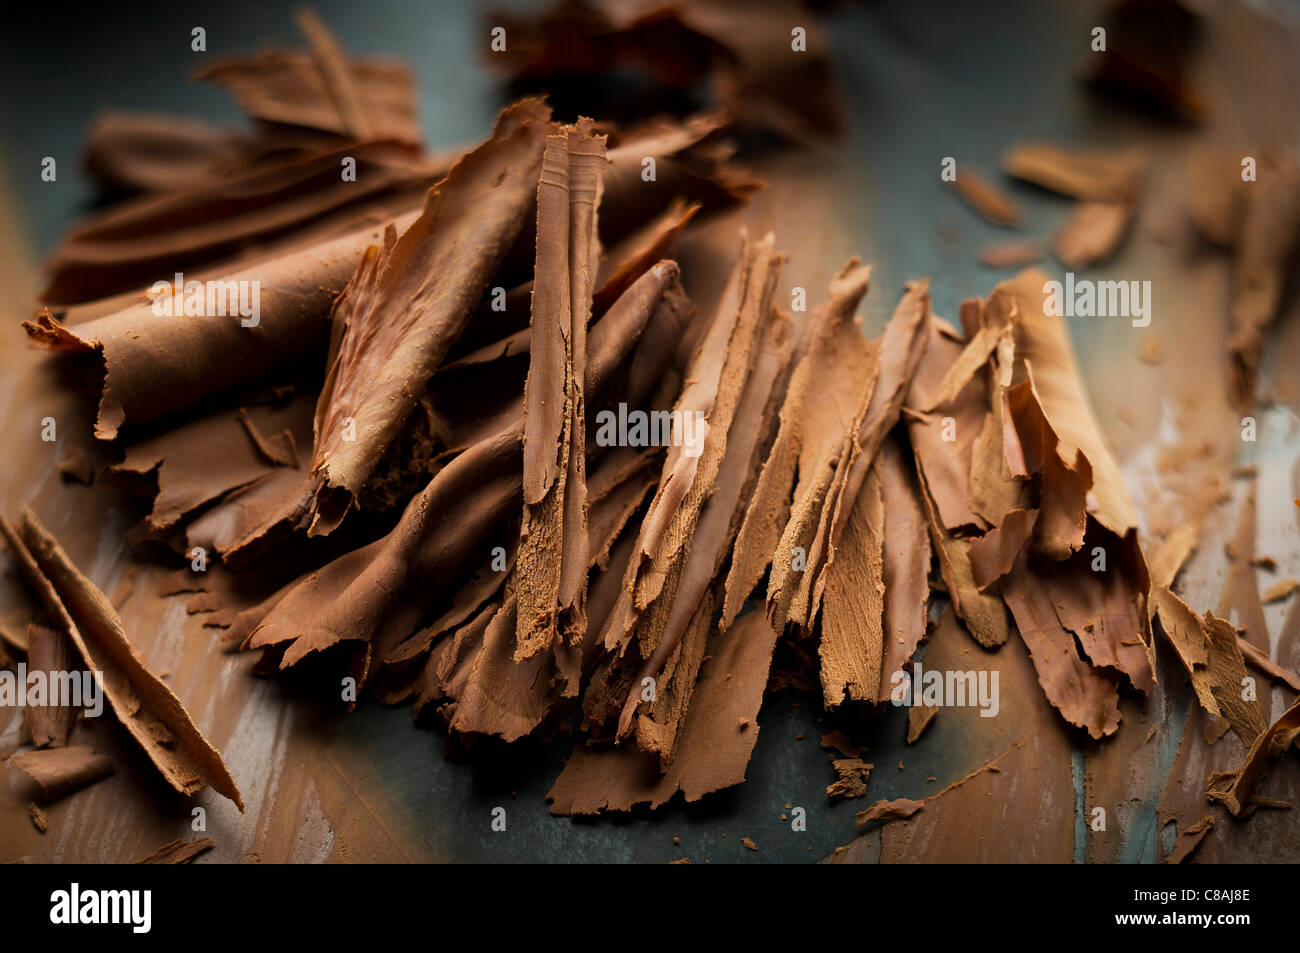 Chocolate flakes - Stock Image